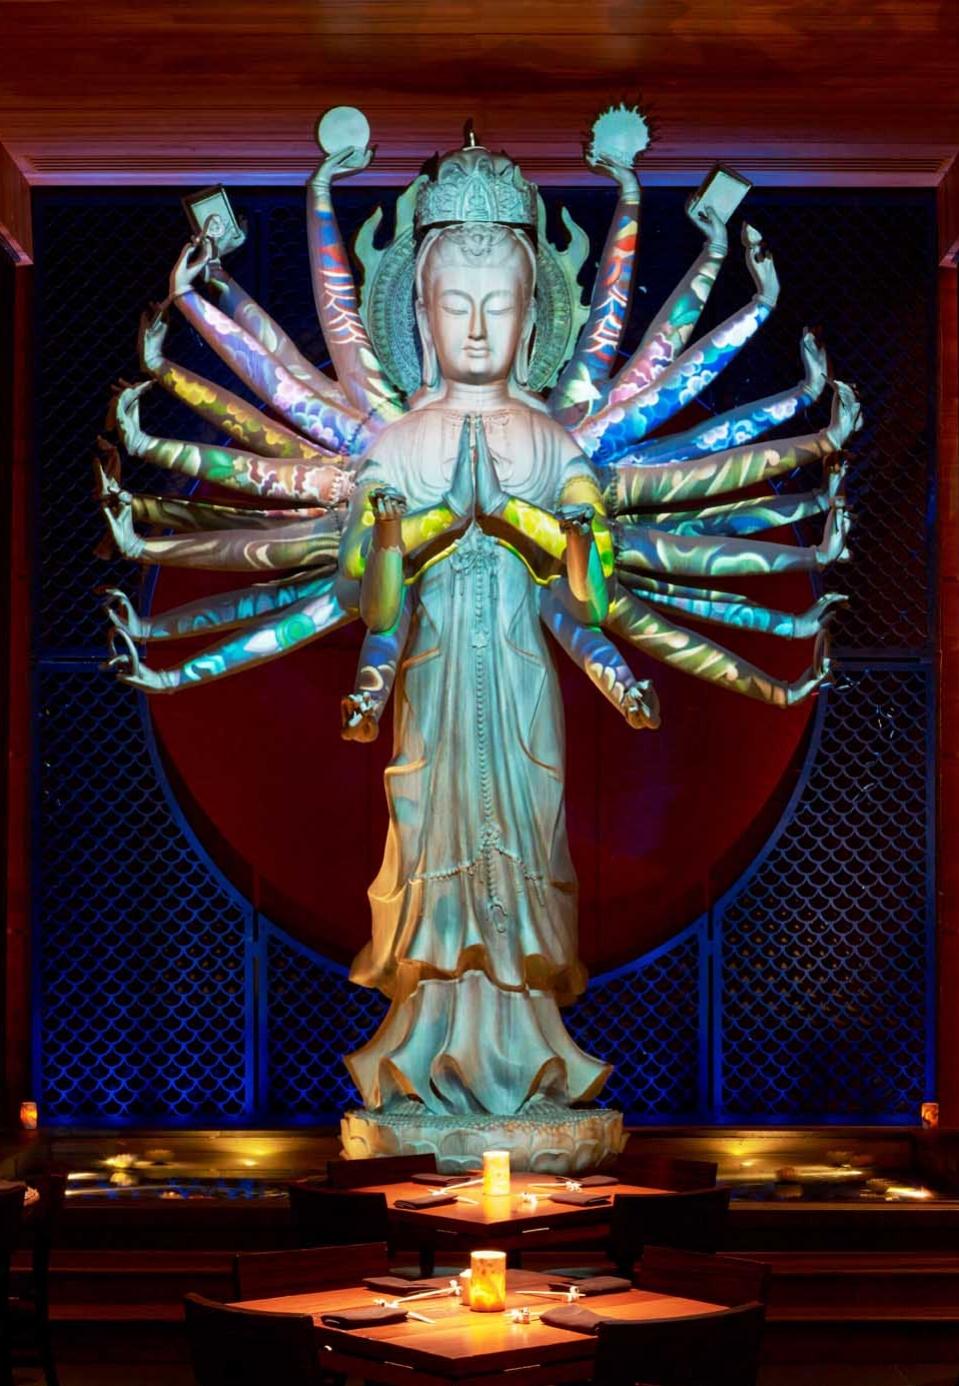 TAO Downtown   A transformative 20-foot Quan Yin statue in the restaurant